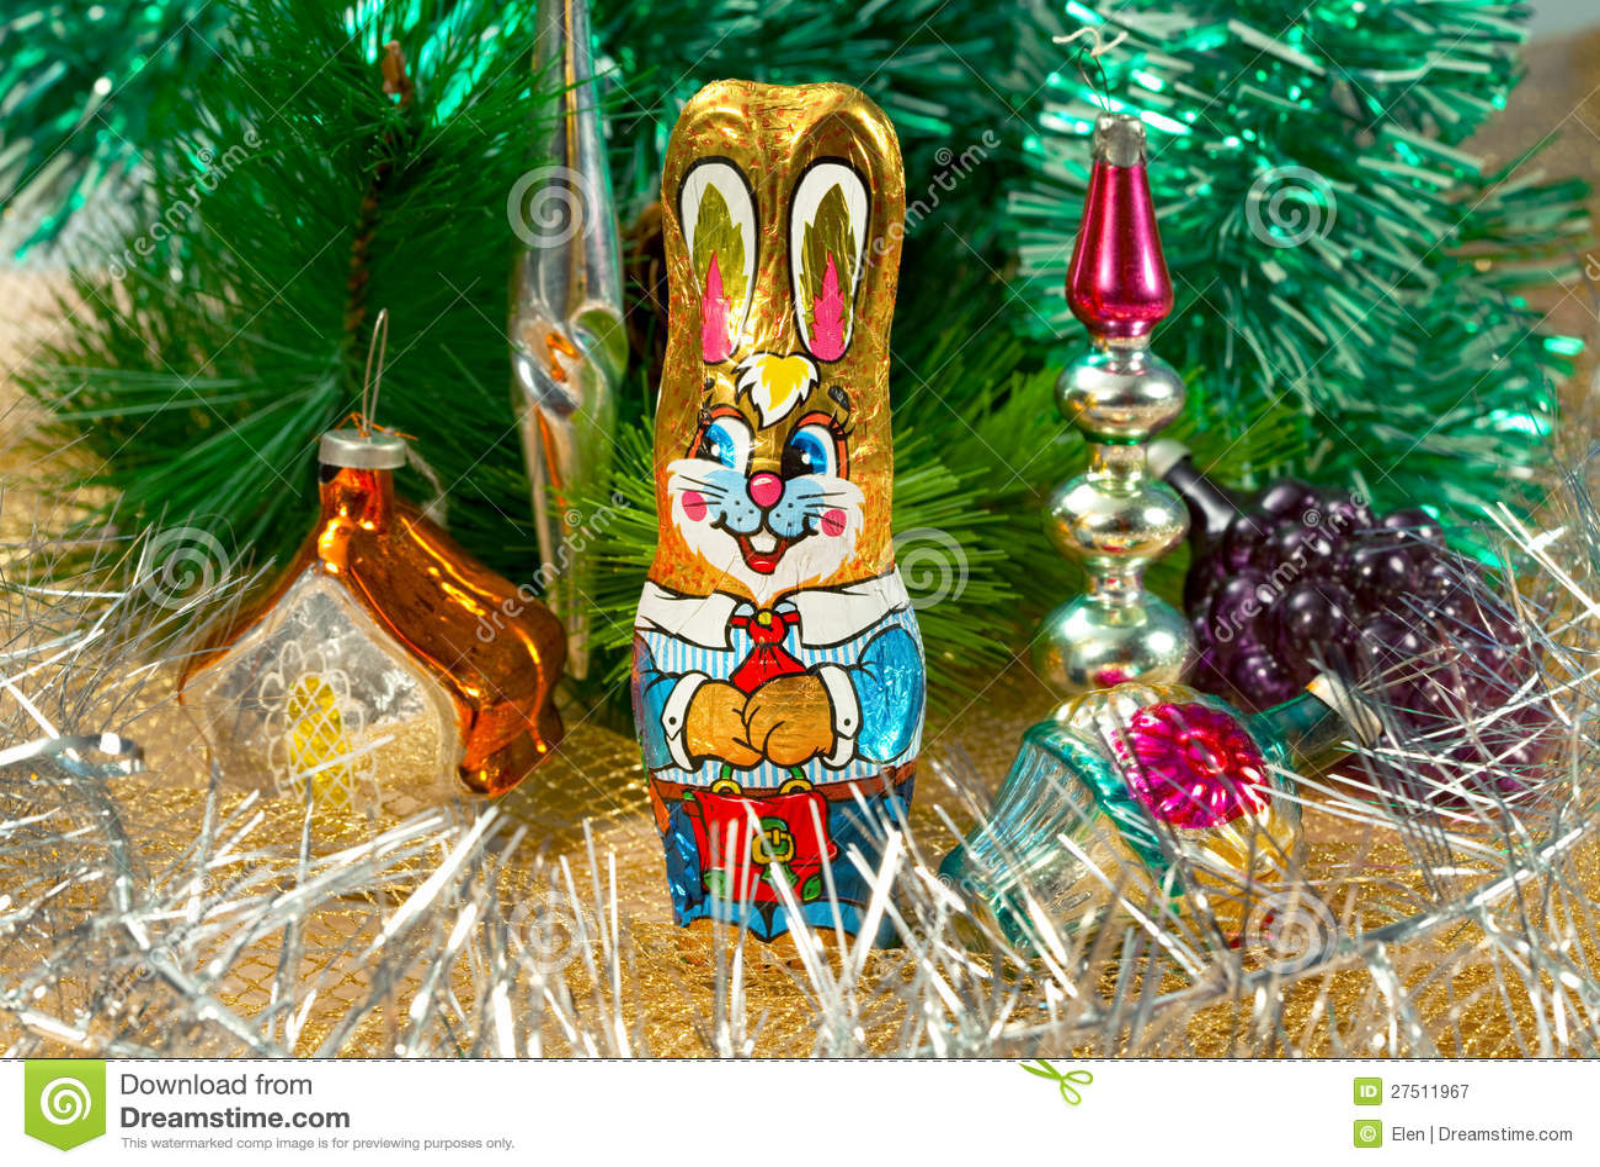 Chocolate rabbit and christmas decorations royalty free for Chocolate christmas decorations